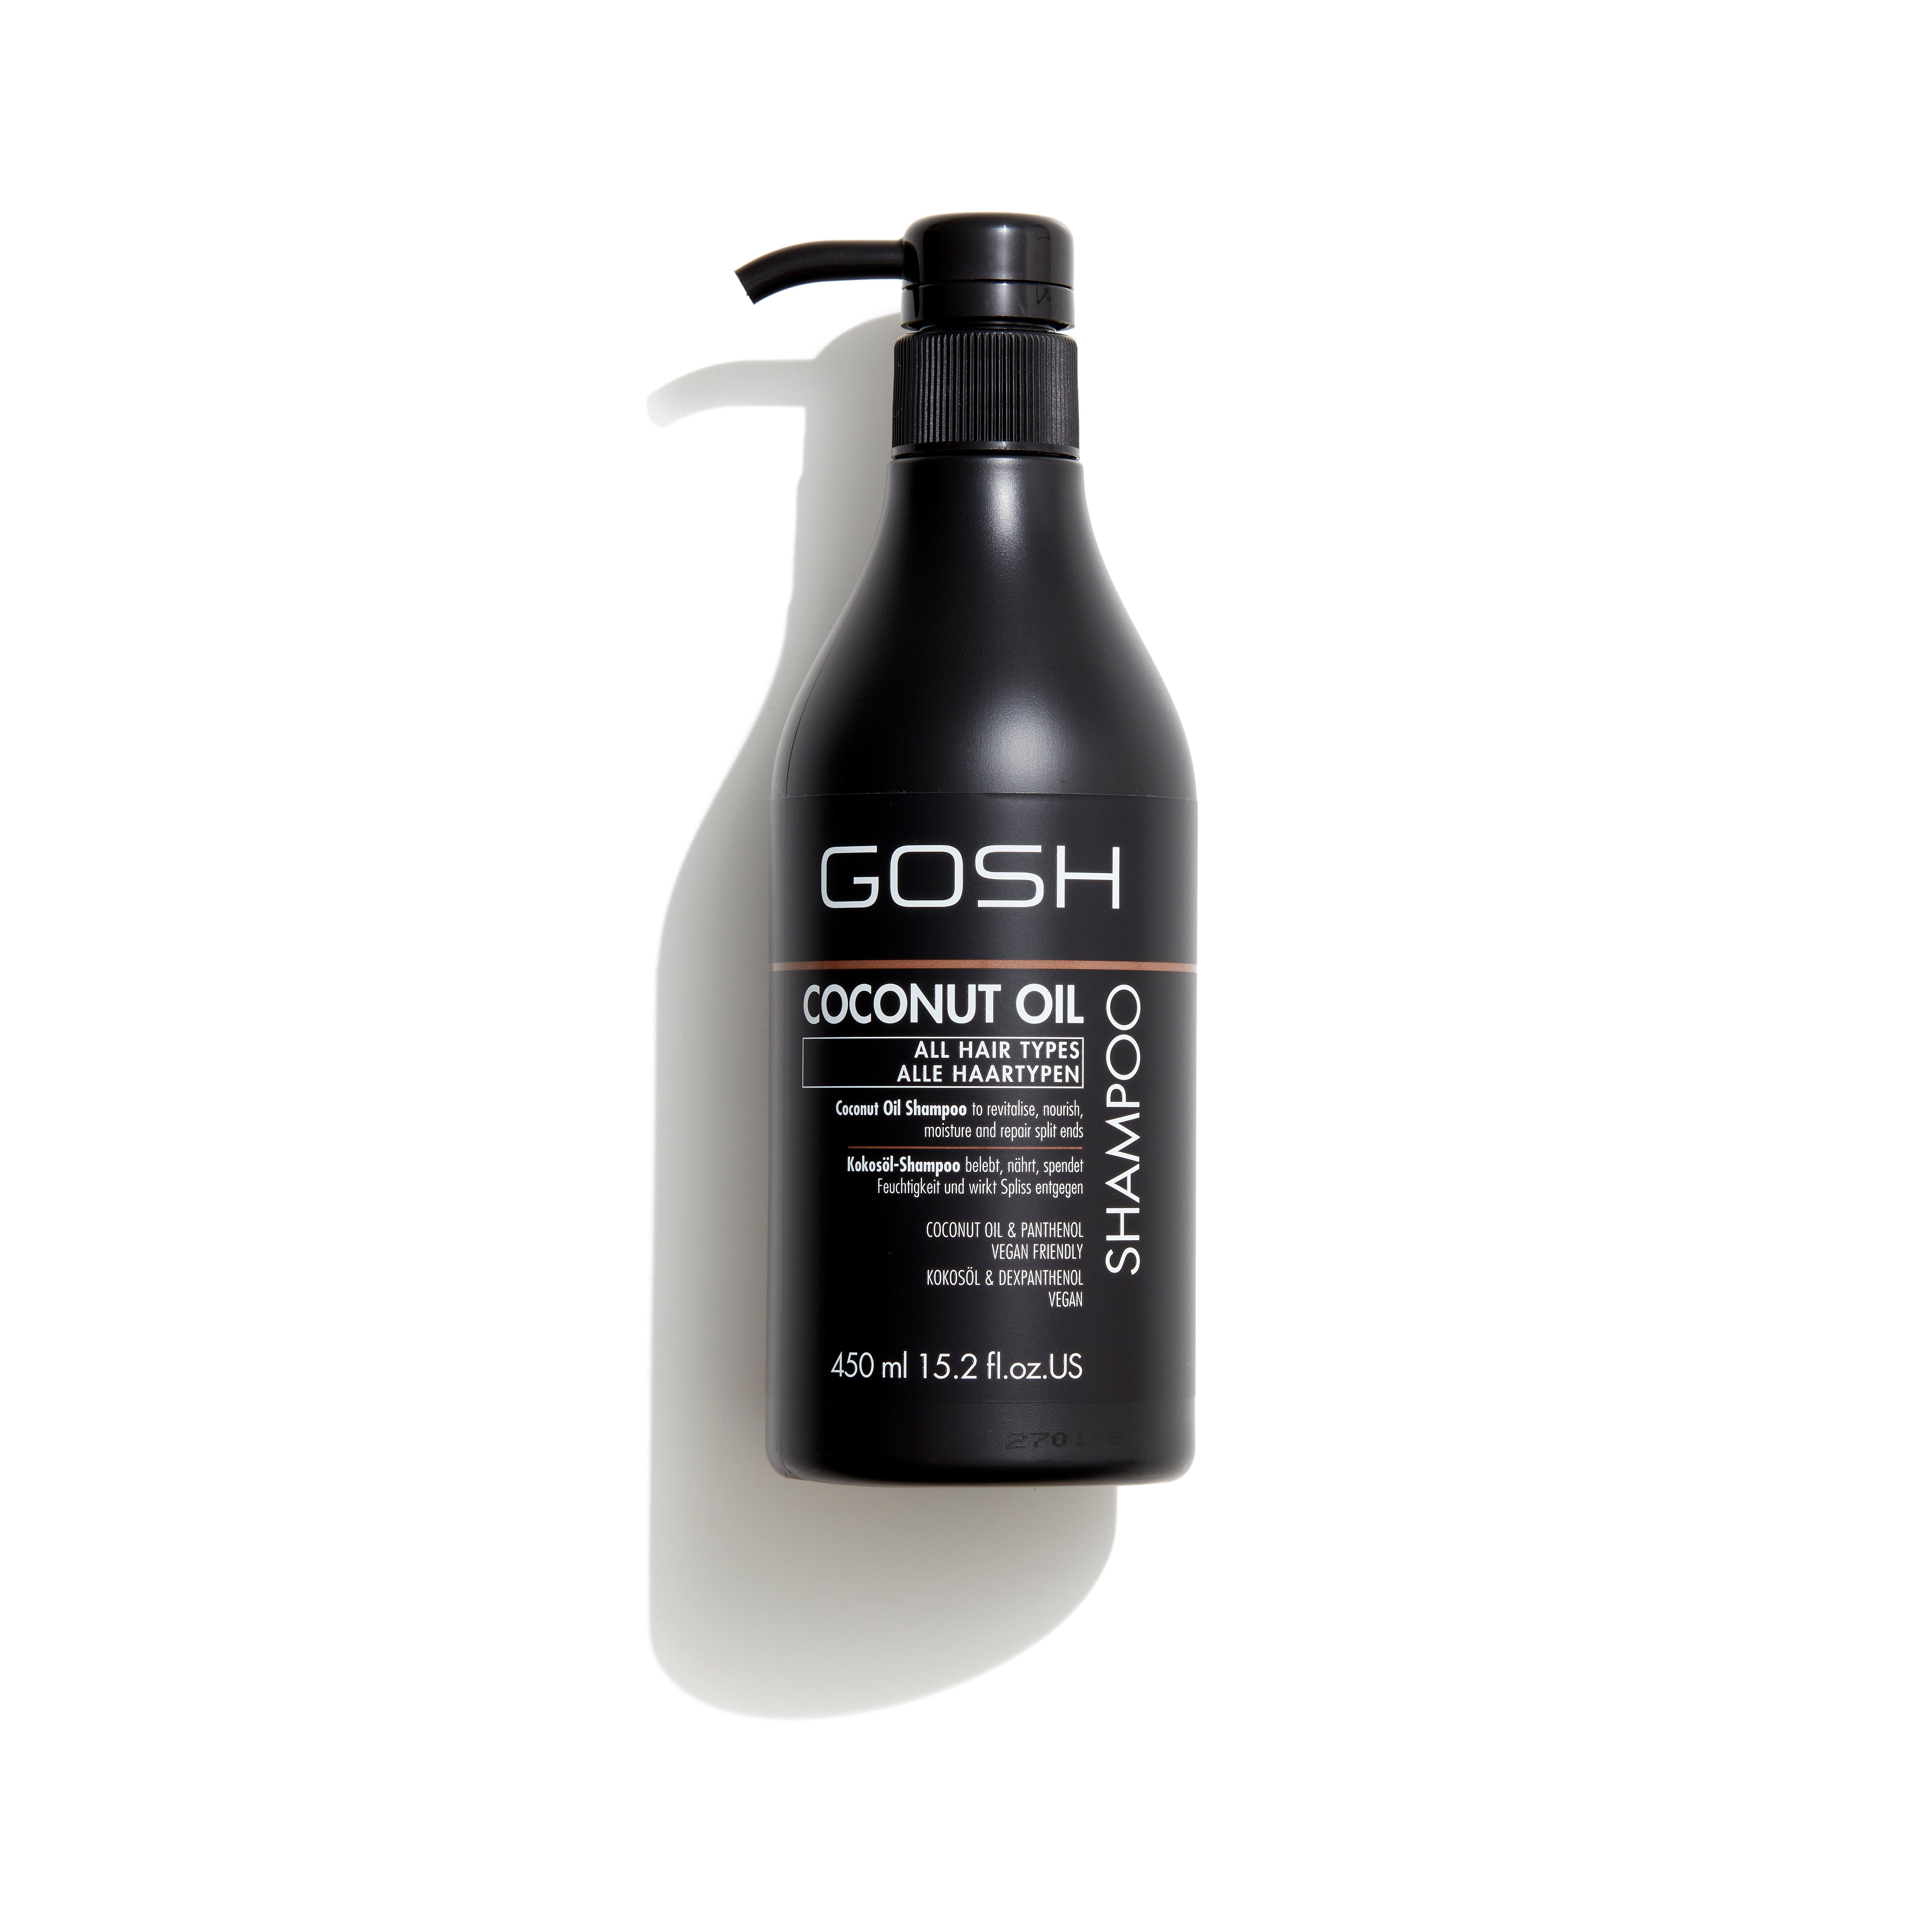 GOSH - Coconut Oil Shampoo 450 ml